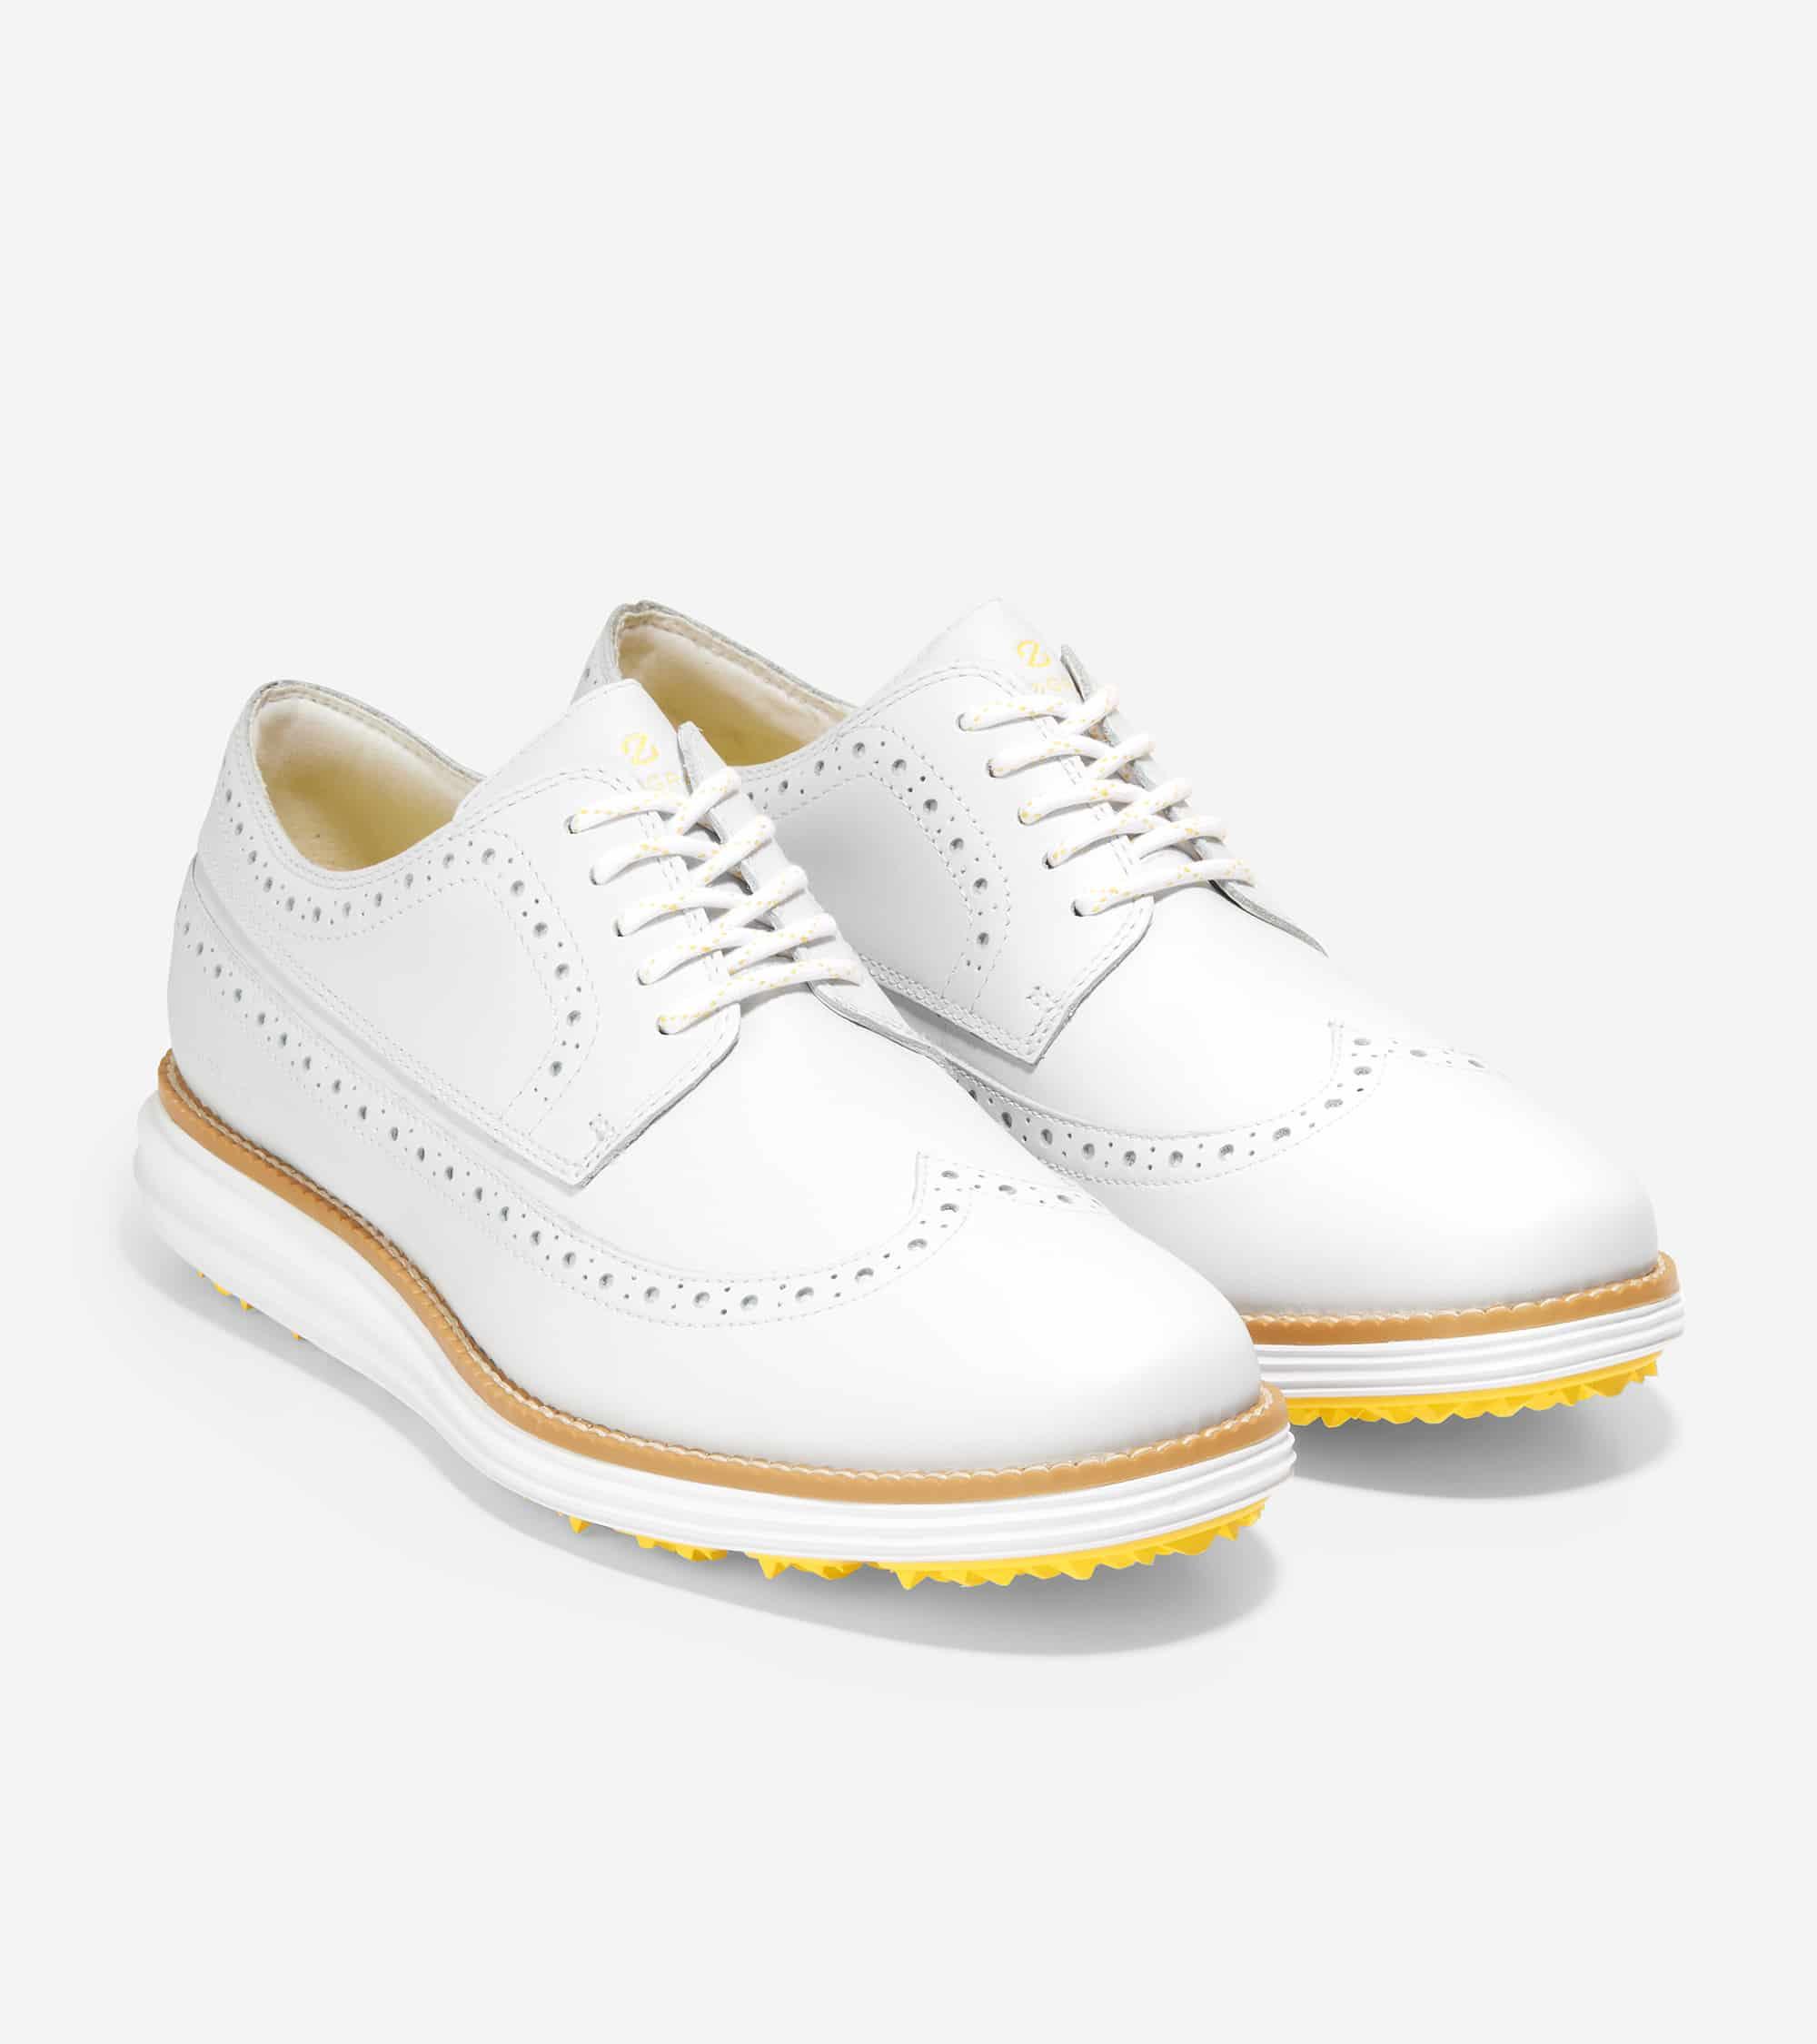 Cole Haan Øriginalgrand Golf Spklss Wp White/White Wp